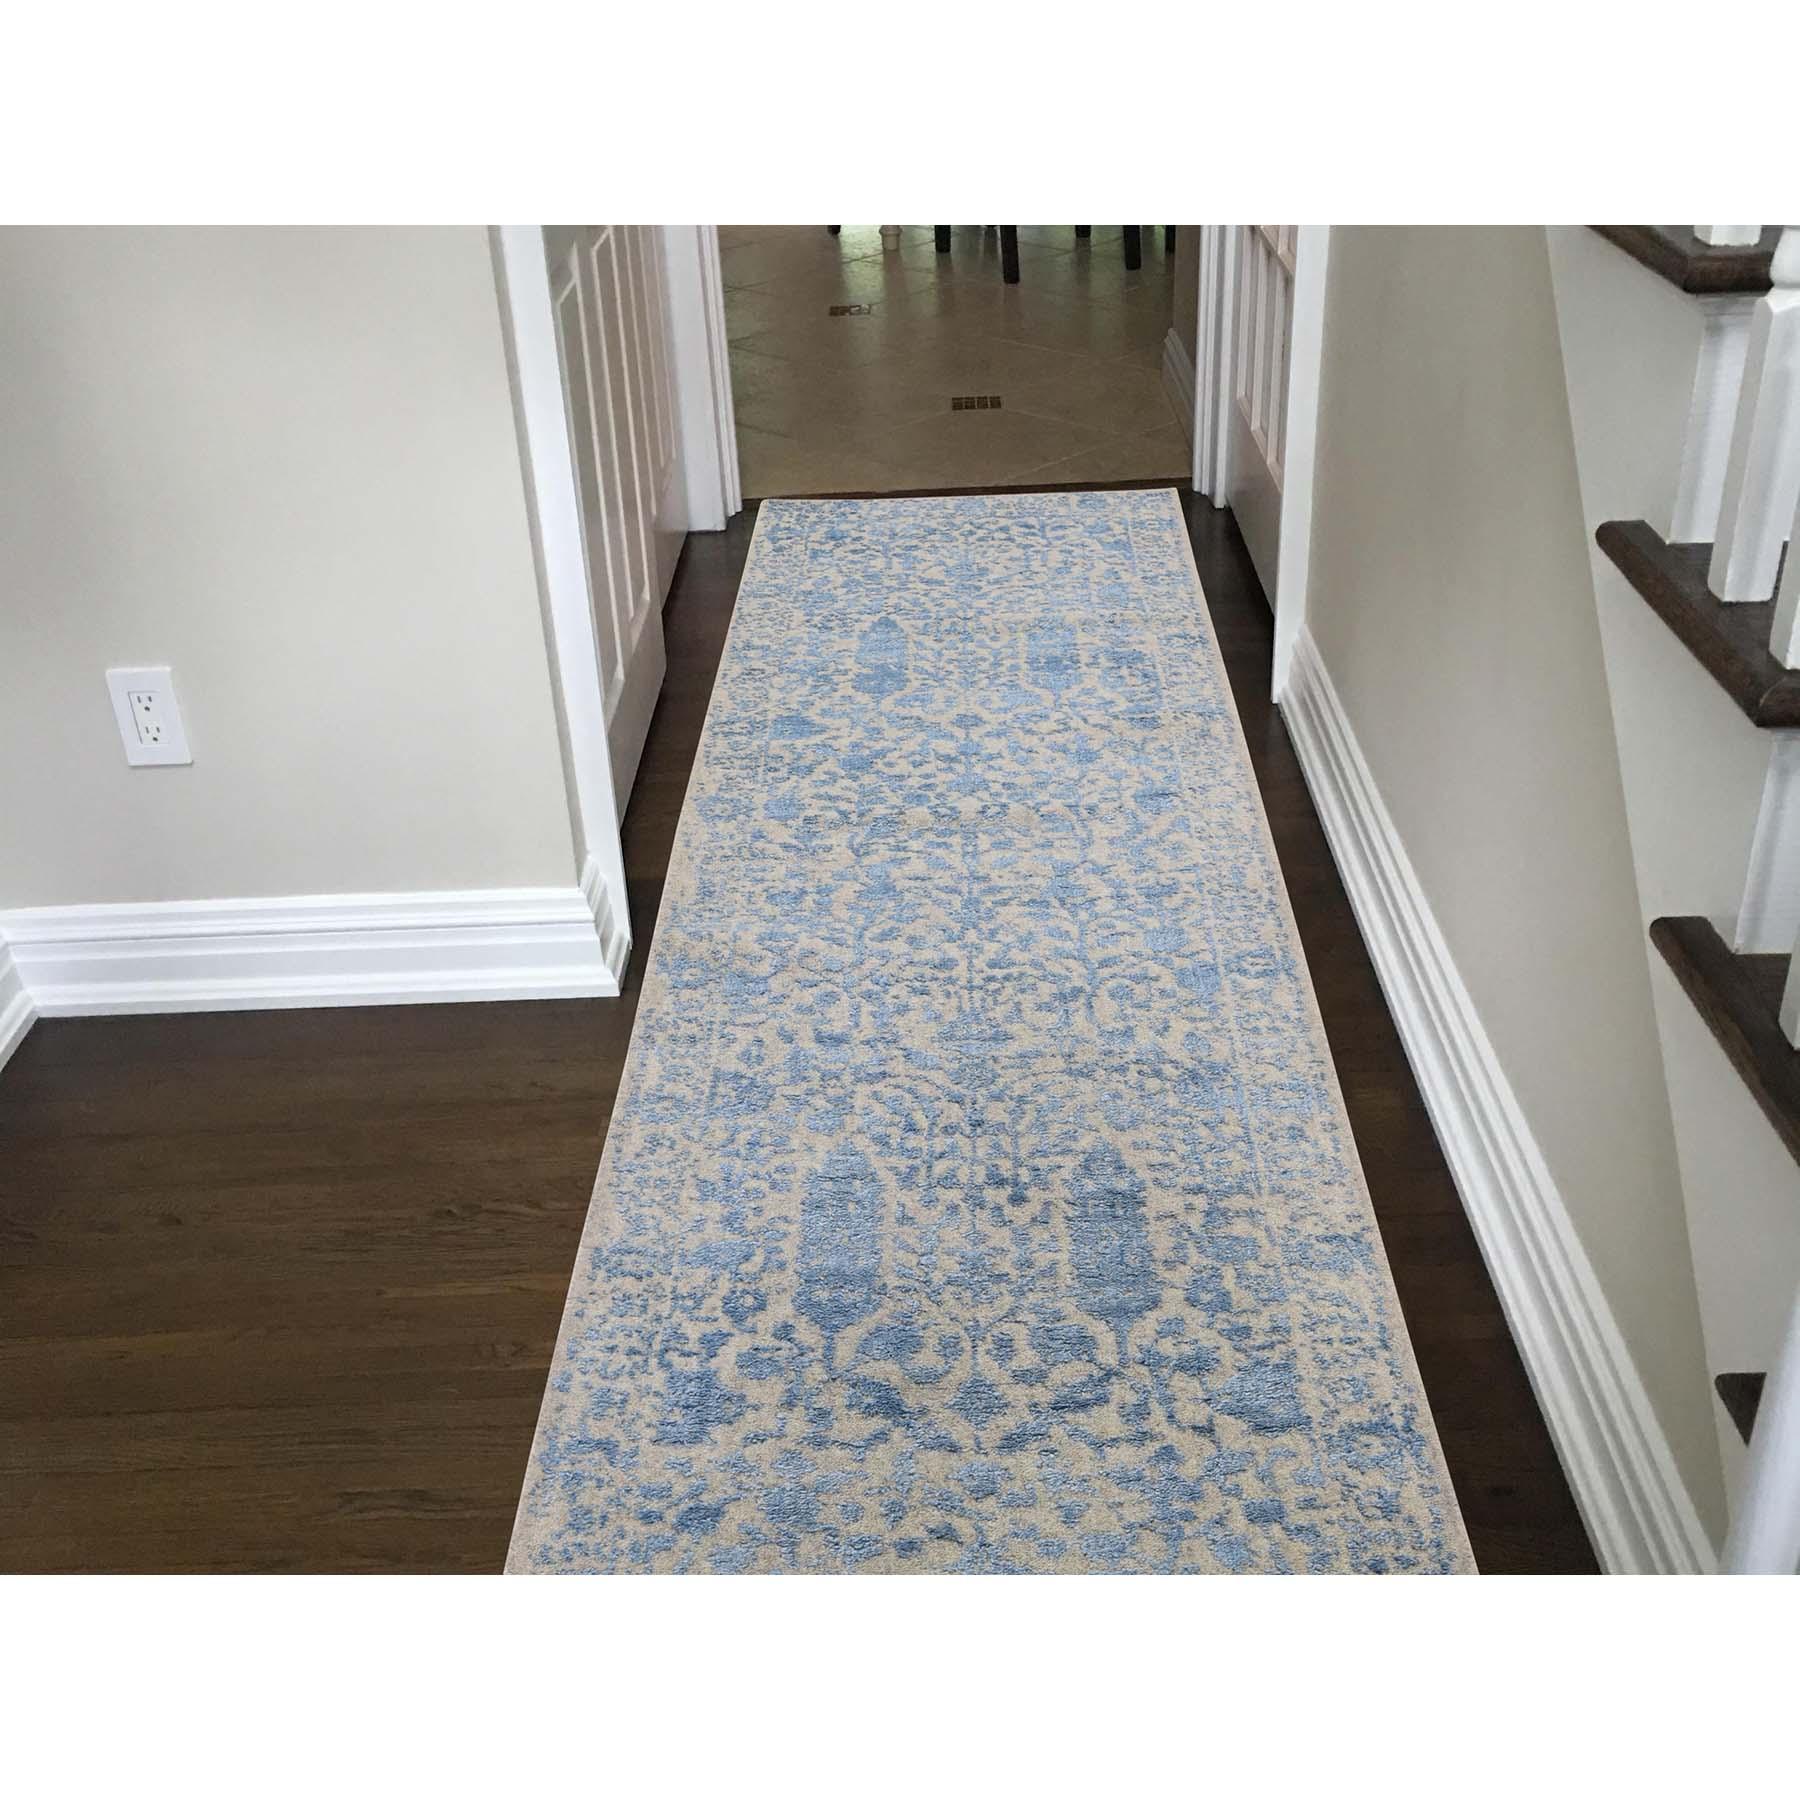 2-6 x10-1  Jacquard Hand-Loomed Blue Broken Cypress Tree Design Silken Thick And Plush Runner Oriental Rug